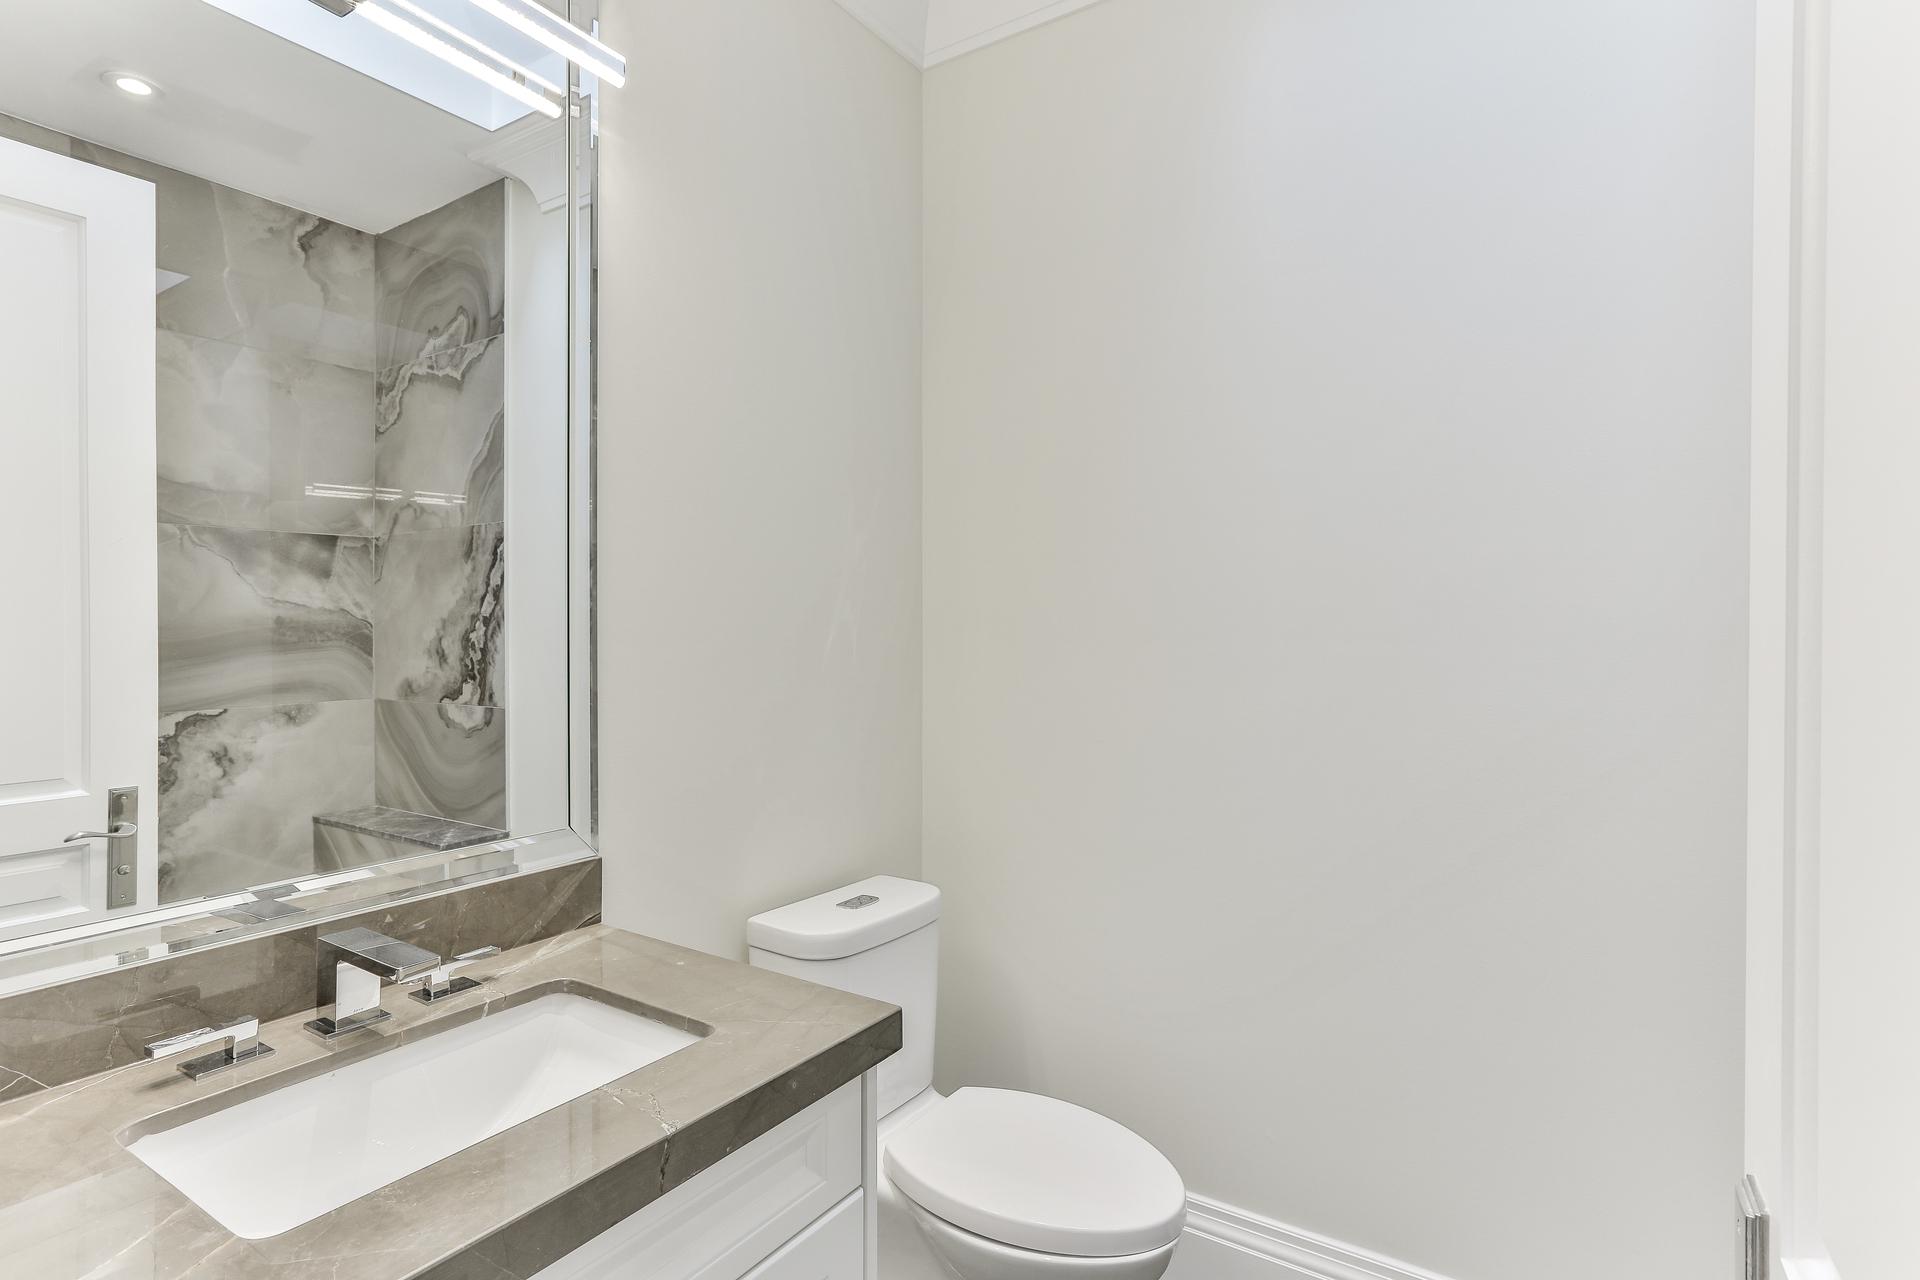 4 Piece Ensuite Bathroom at 36 Laurentide Drive, Parkwoods-Donalda, Toronto